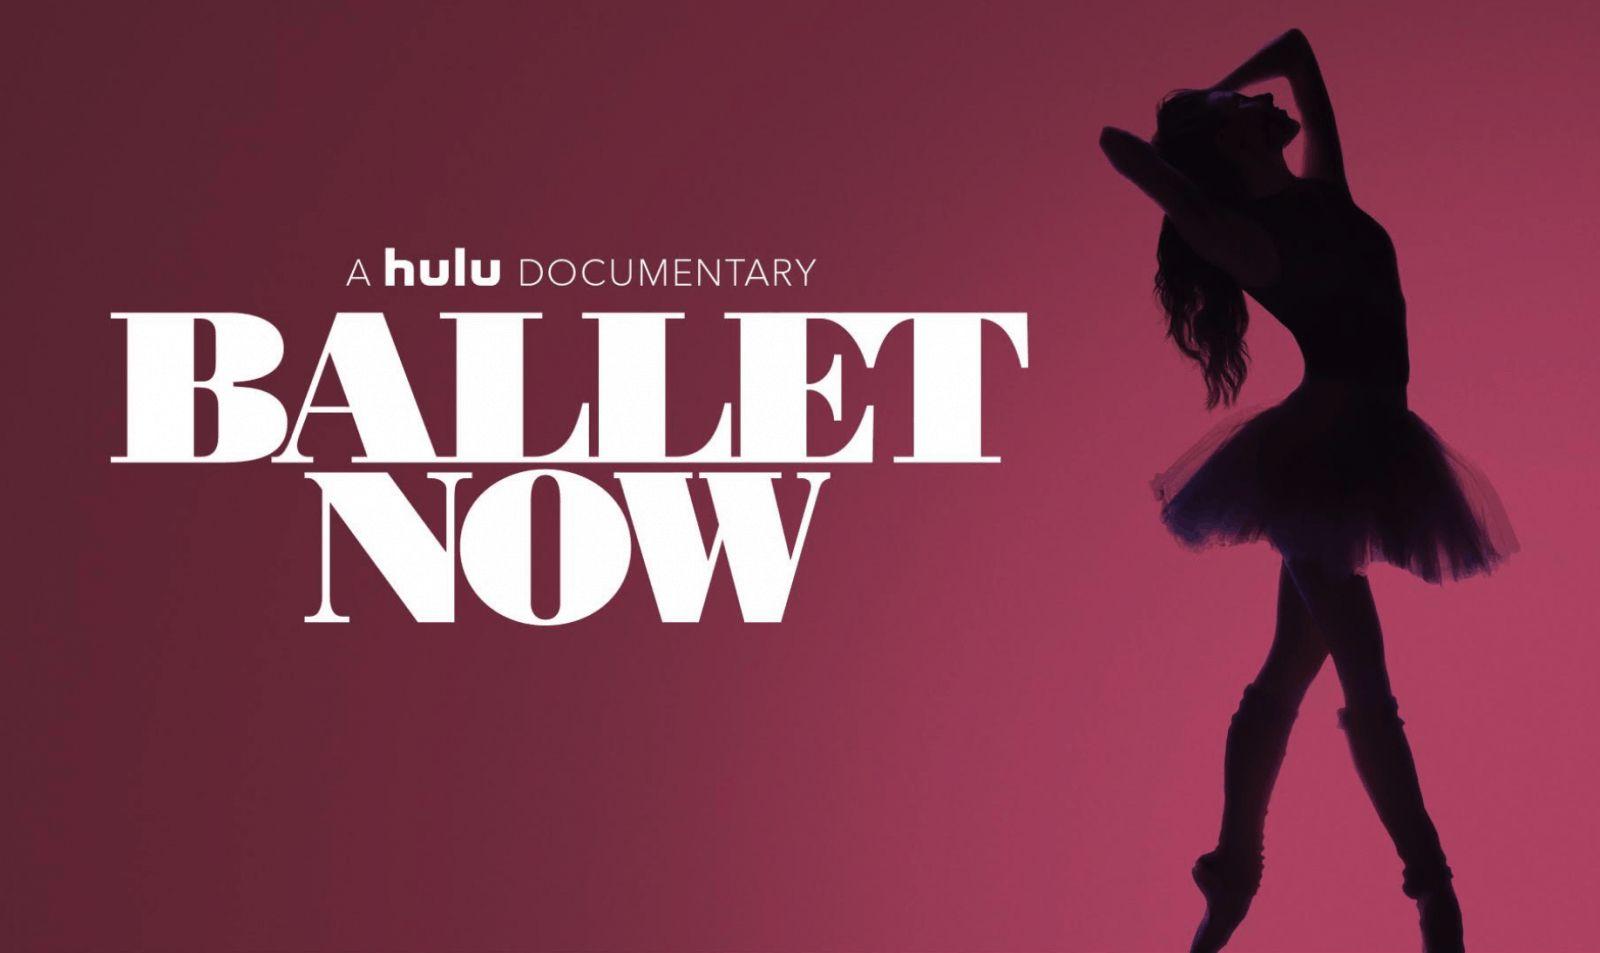 Ballet Now documentary poster